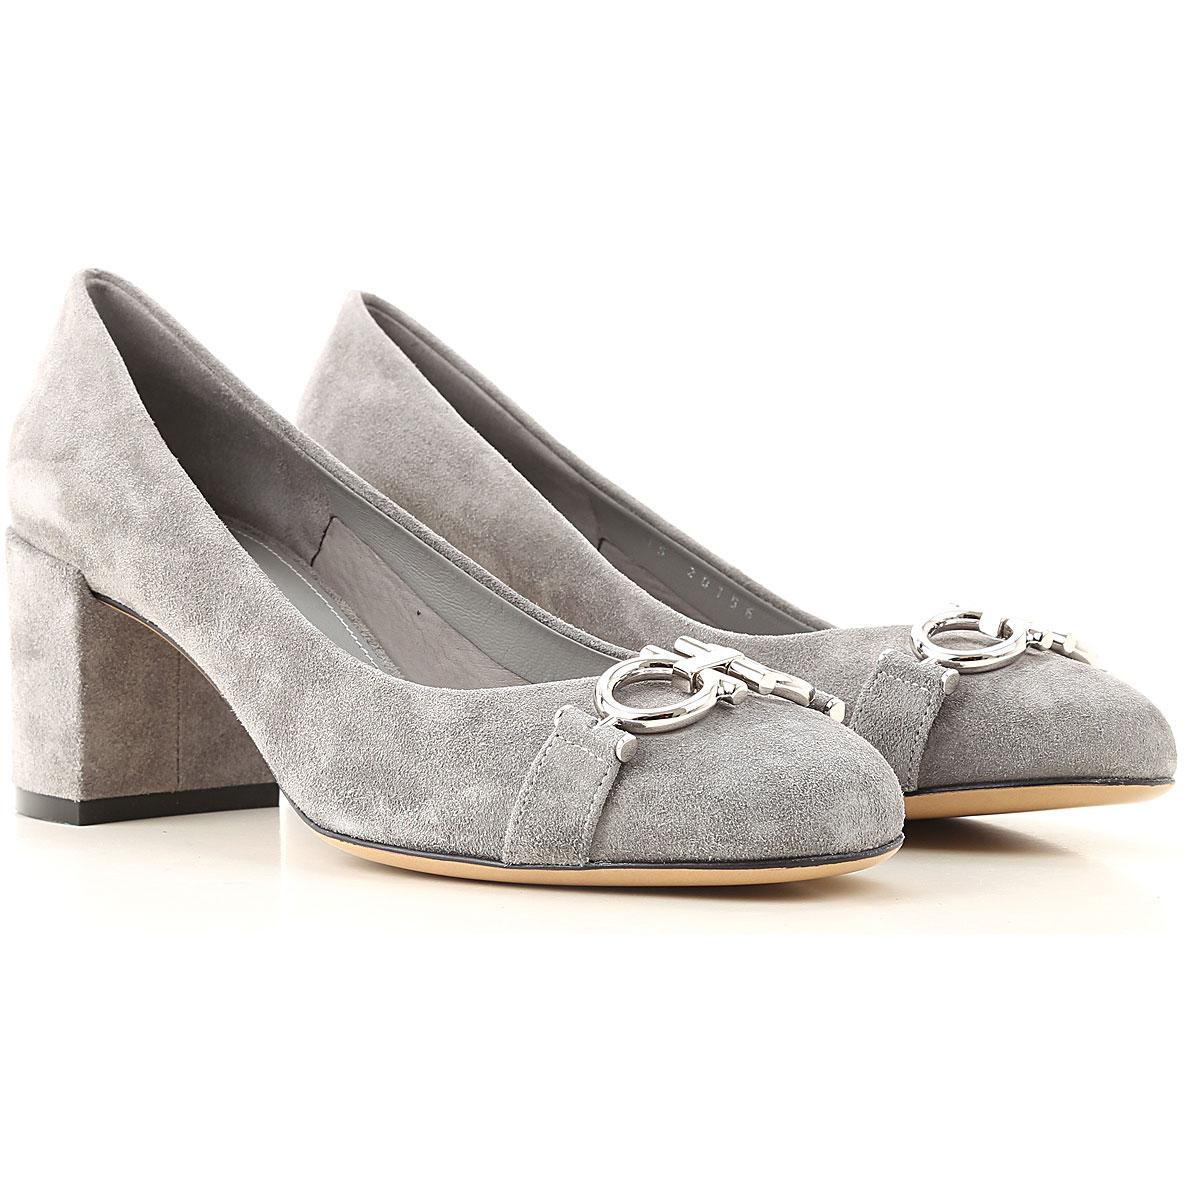 Salvatore Ferragamo Pumps & High Heels for Women On Sale, Mercury Grey, Suede leather, 2019, 5 5.5 6.5 8 8.5 9.5